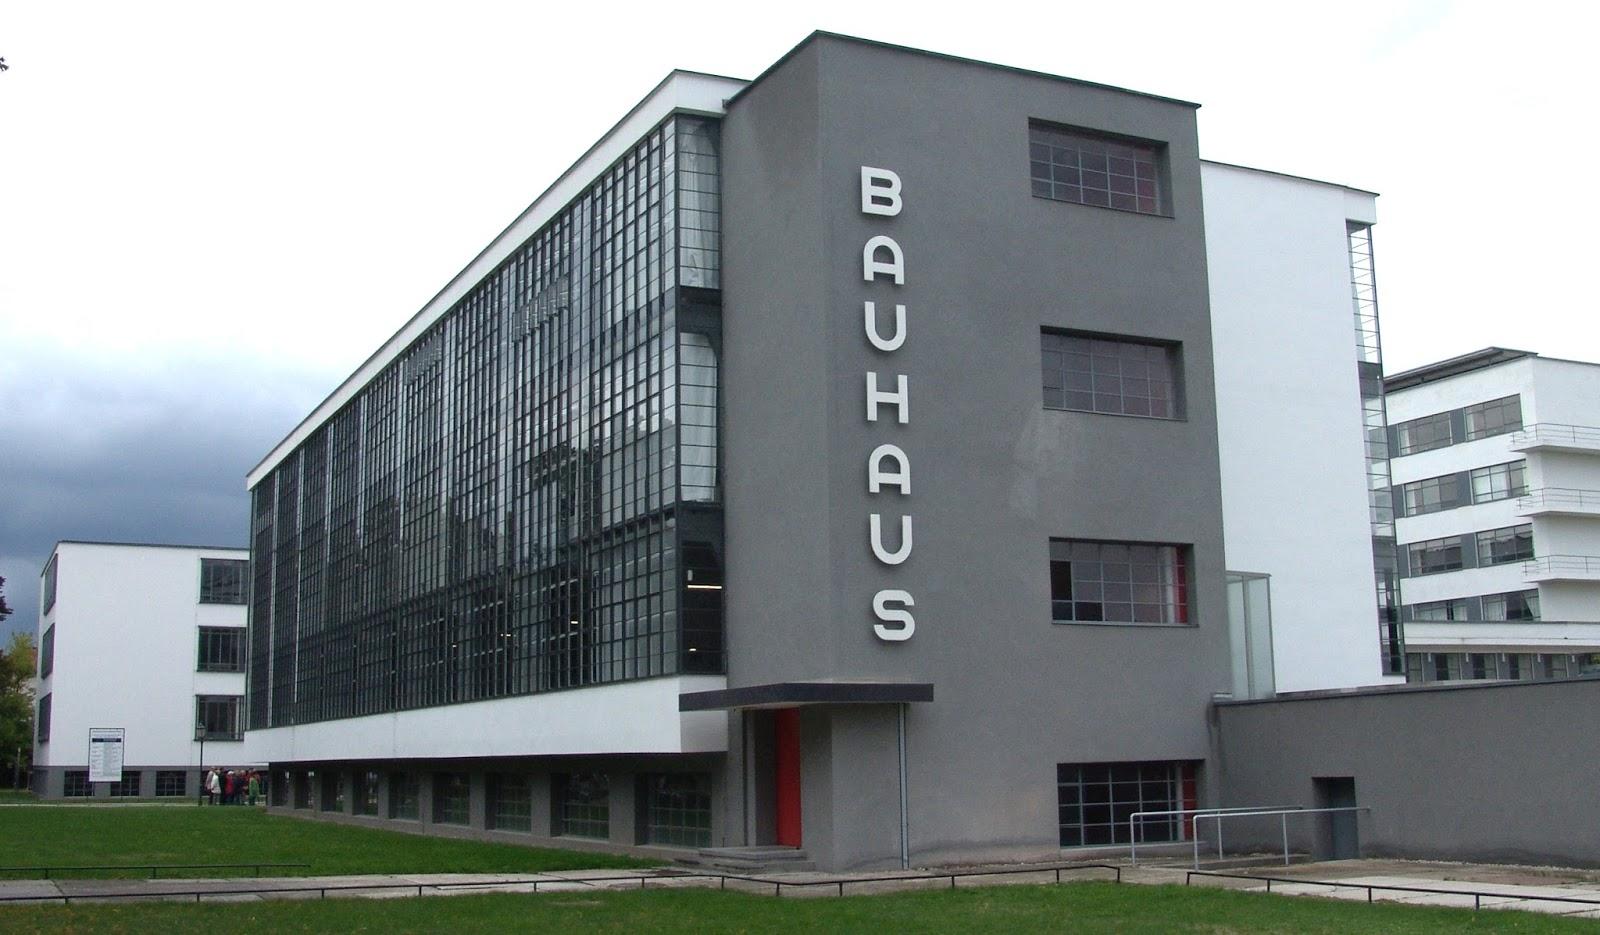 Bauhaus Dessau Building